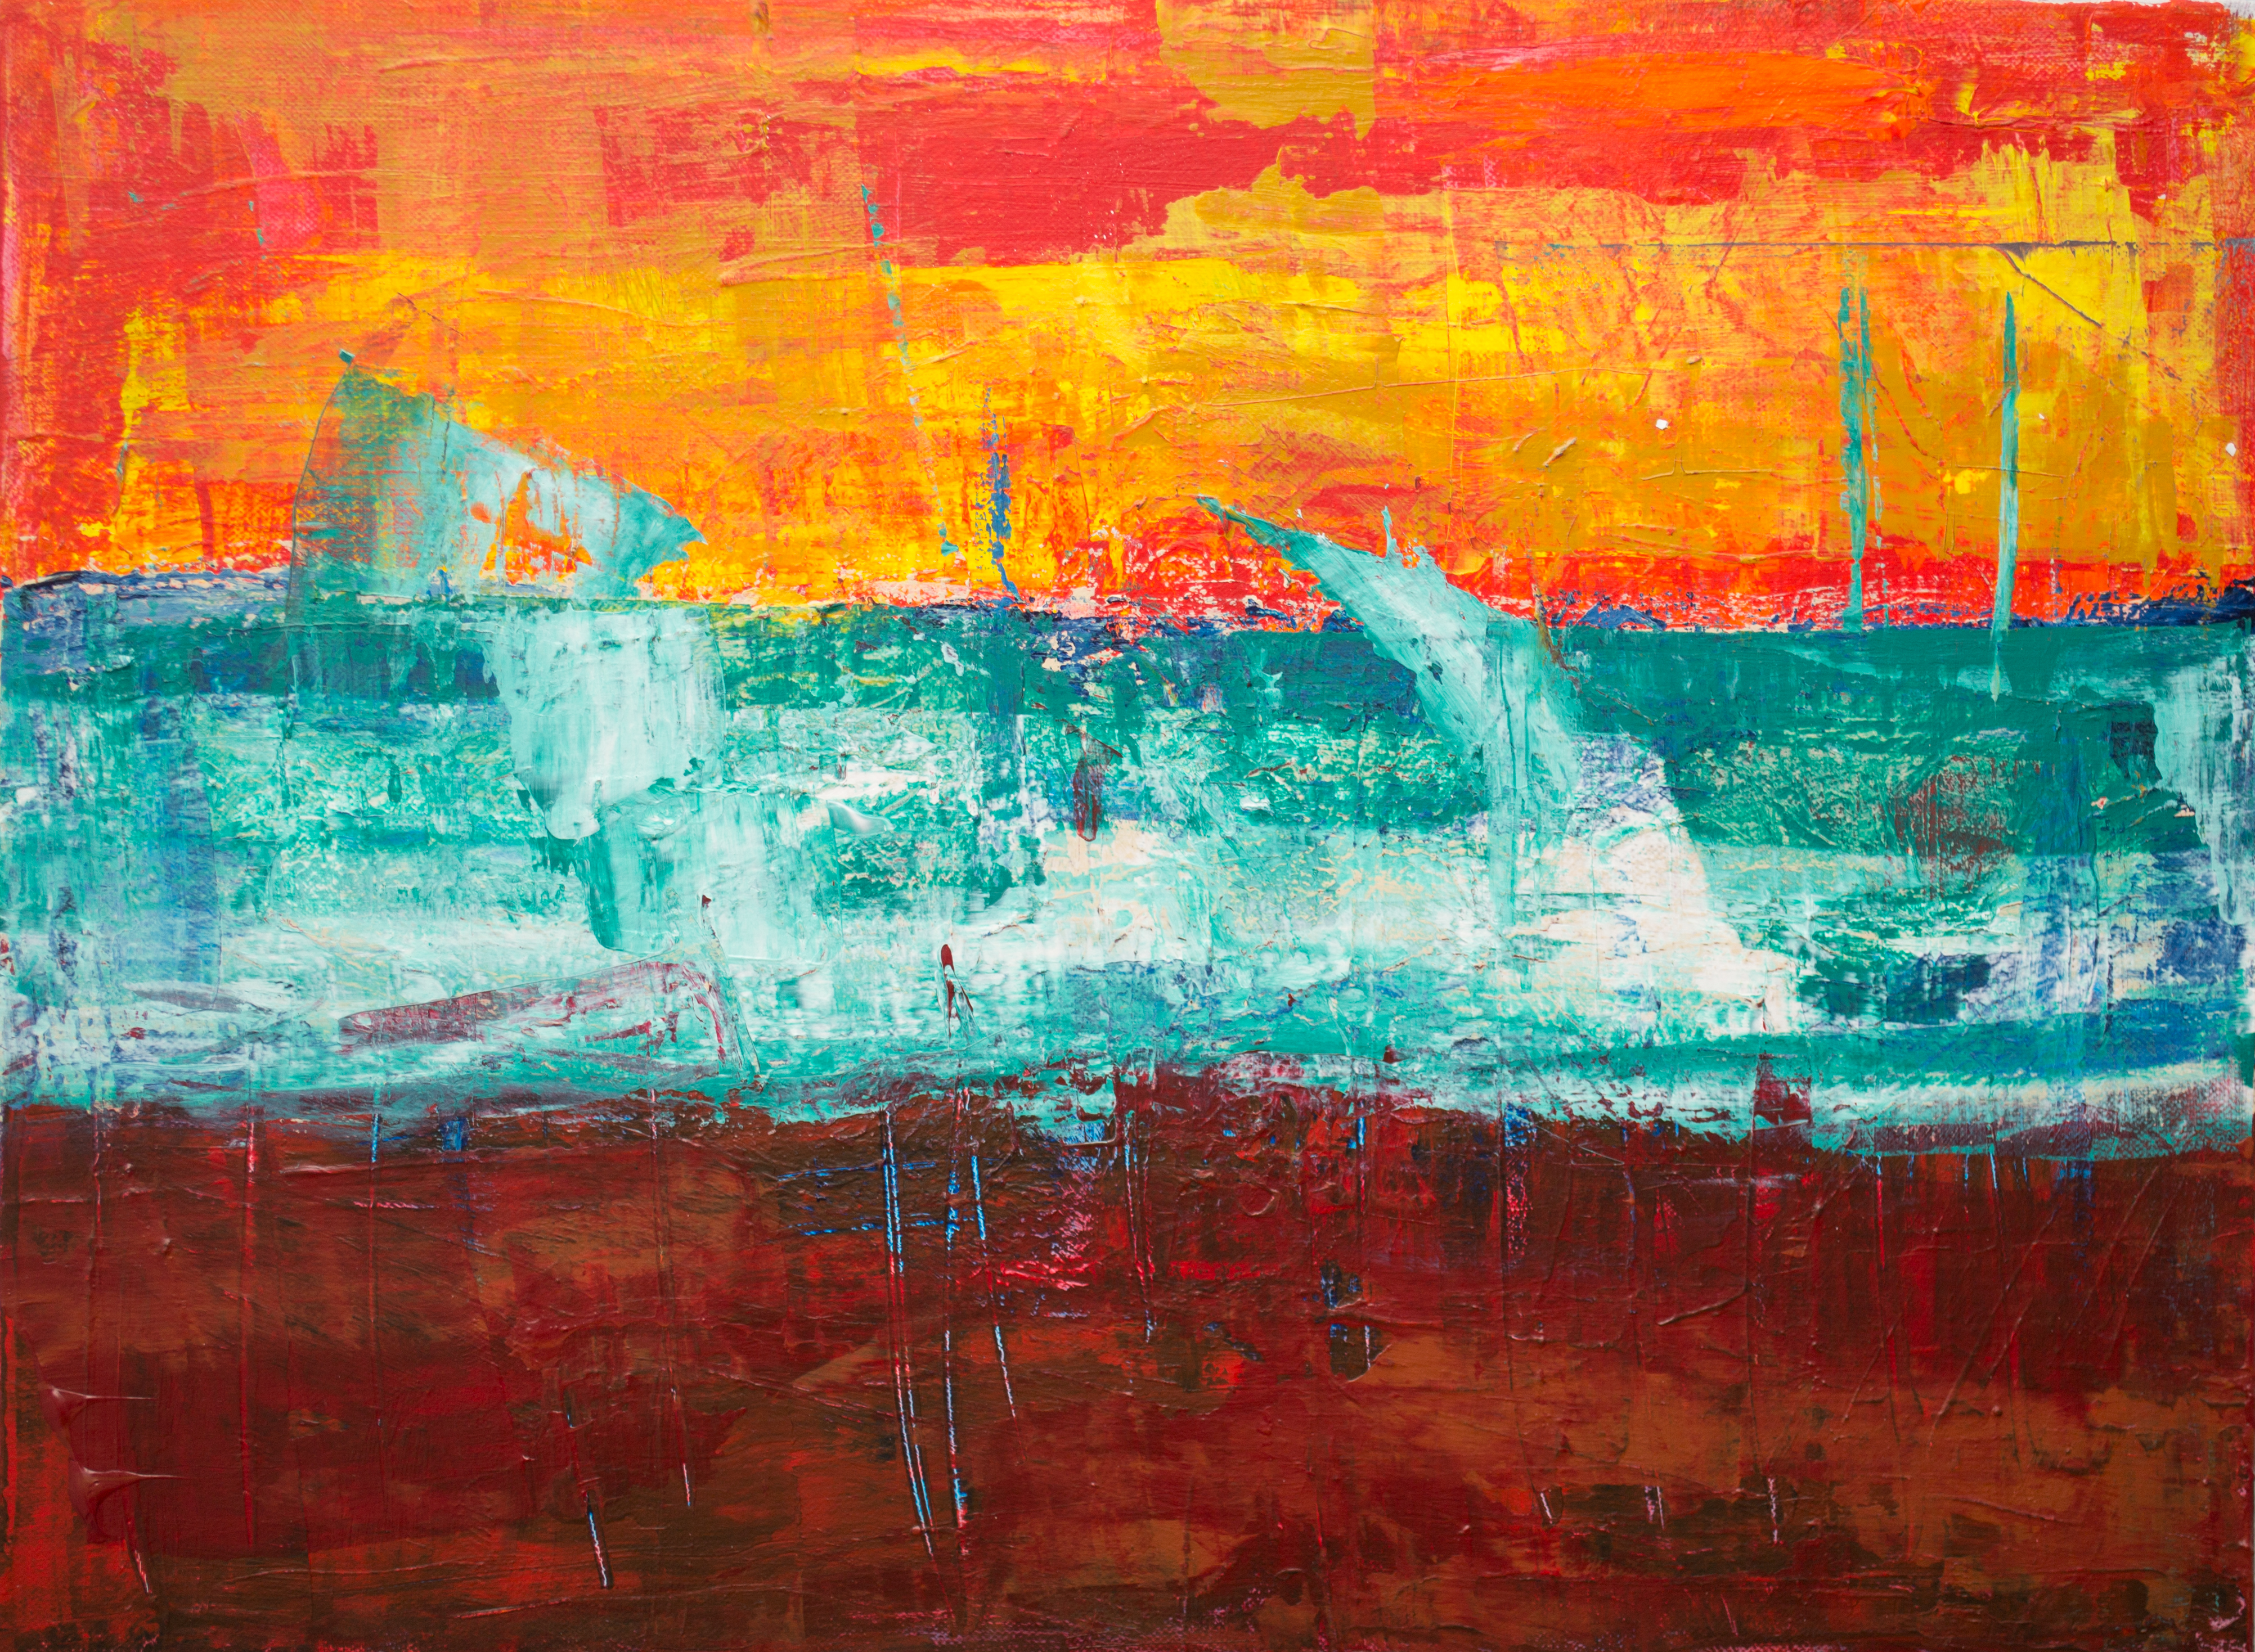 Painting Wallpaper · Free Stock Photo